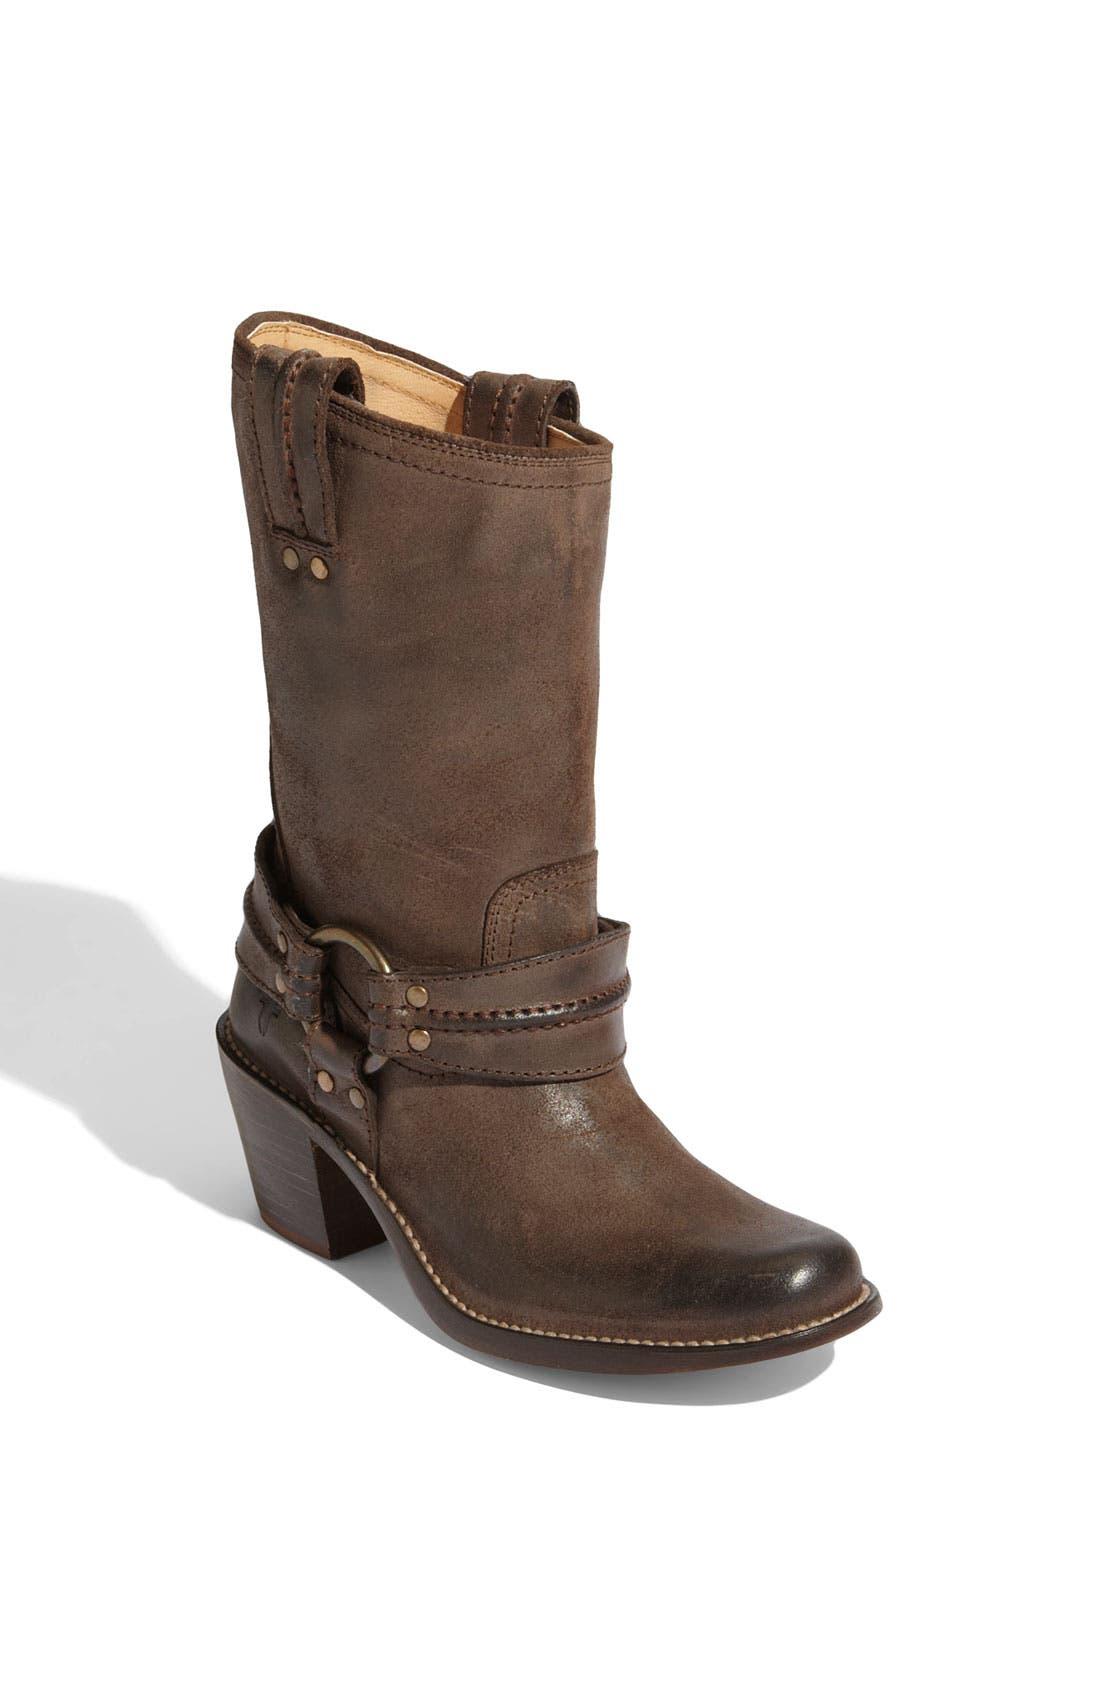 Main Image - Frye 'Carmen' Harness Short Boot